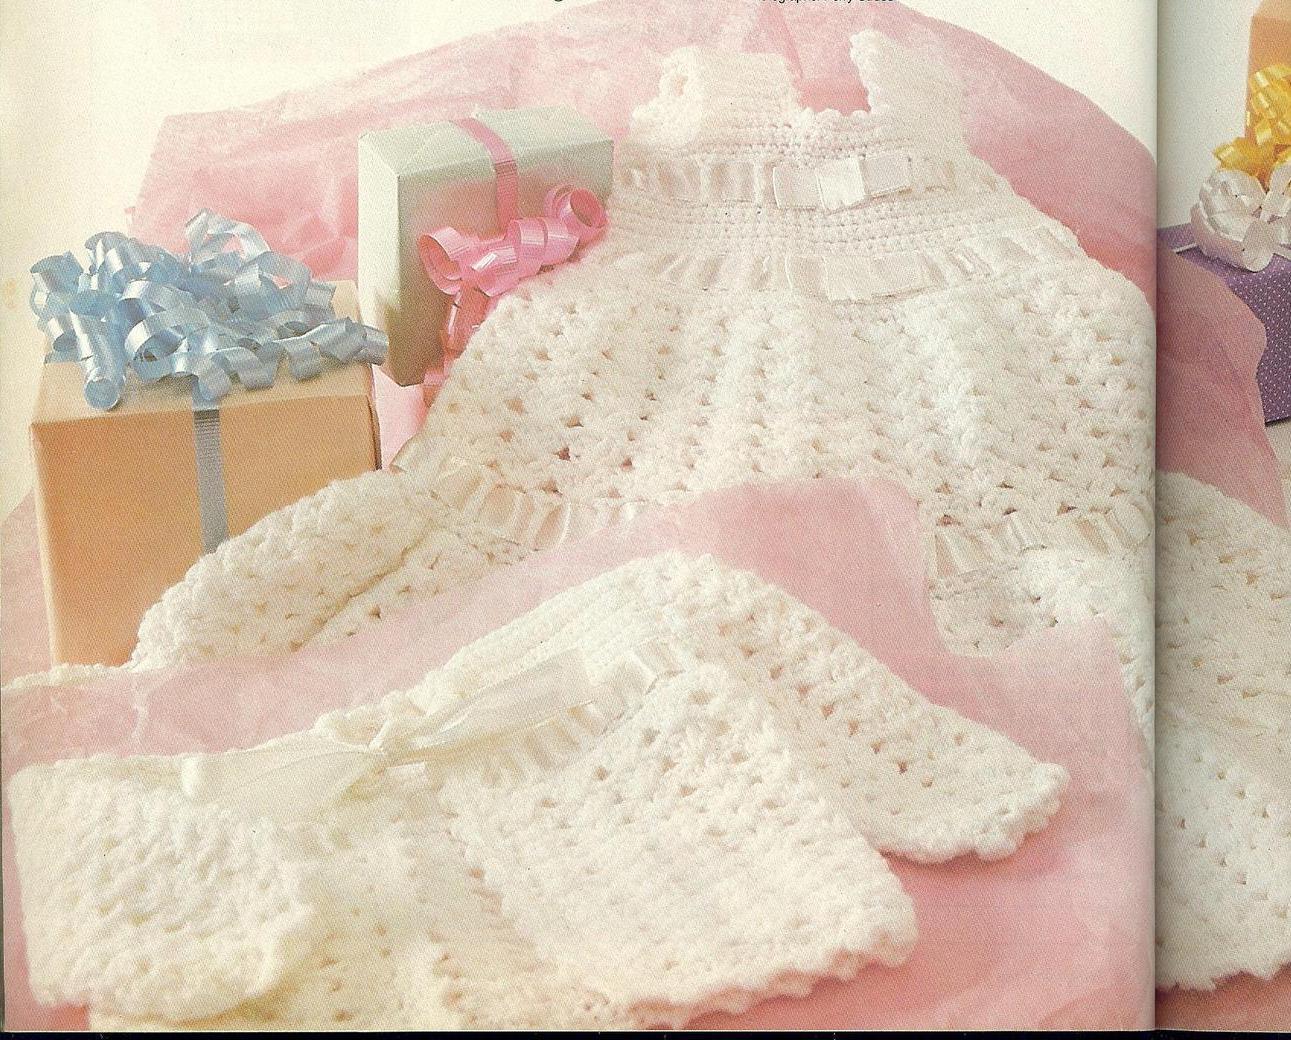 Crochet Pattern For Christening Gown : Christening Gown, Bonnet & Sweater Crochet Pattern - Baby ...